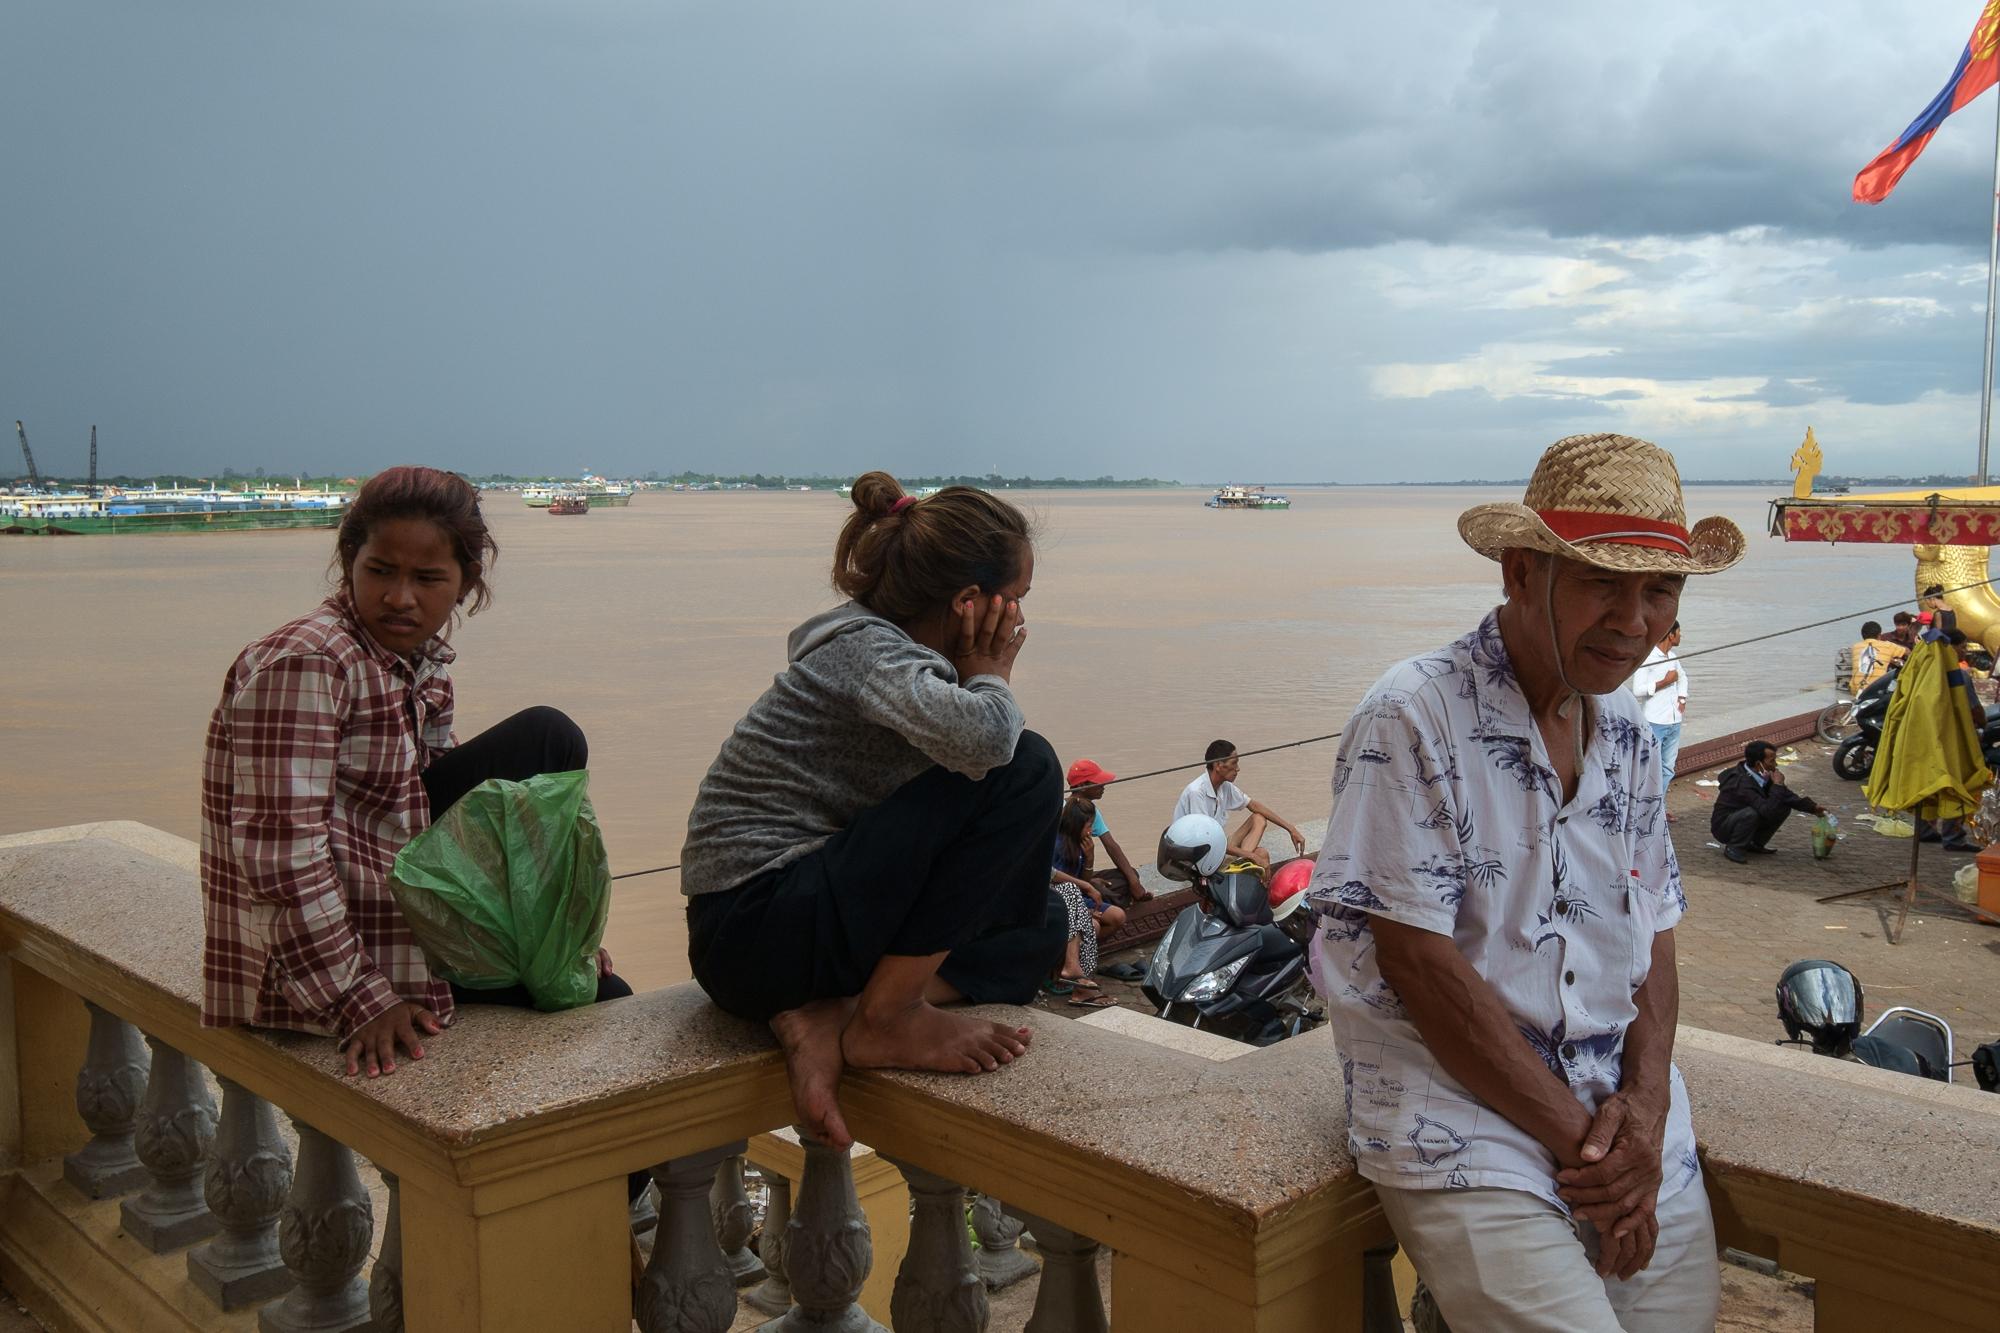 Phnom Penh - on the Mekong banks